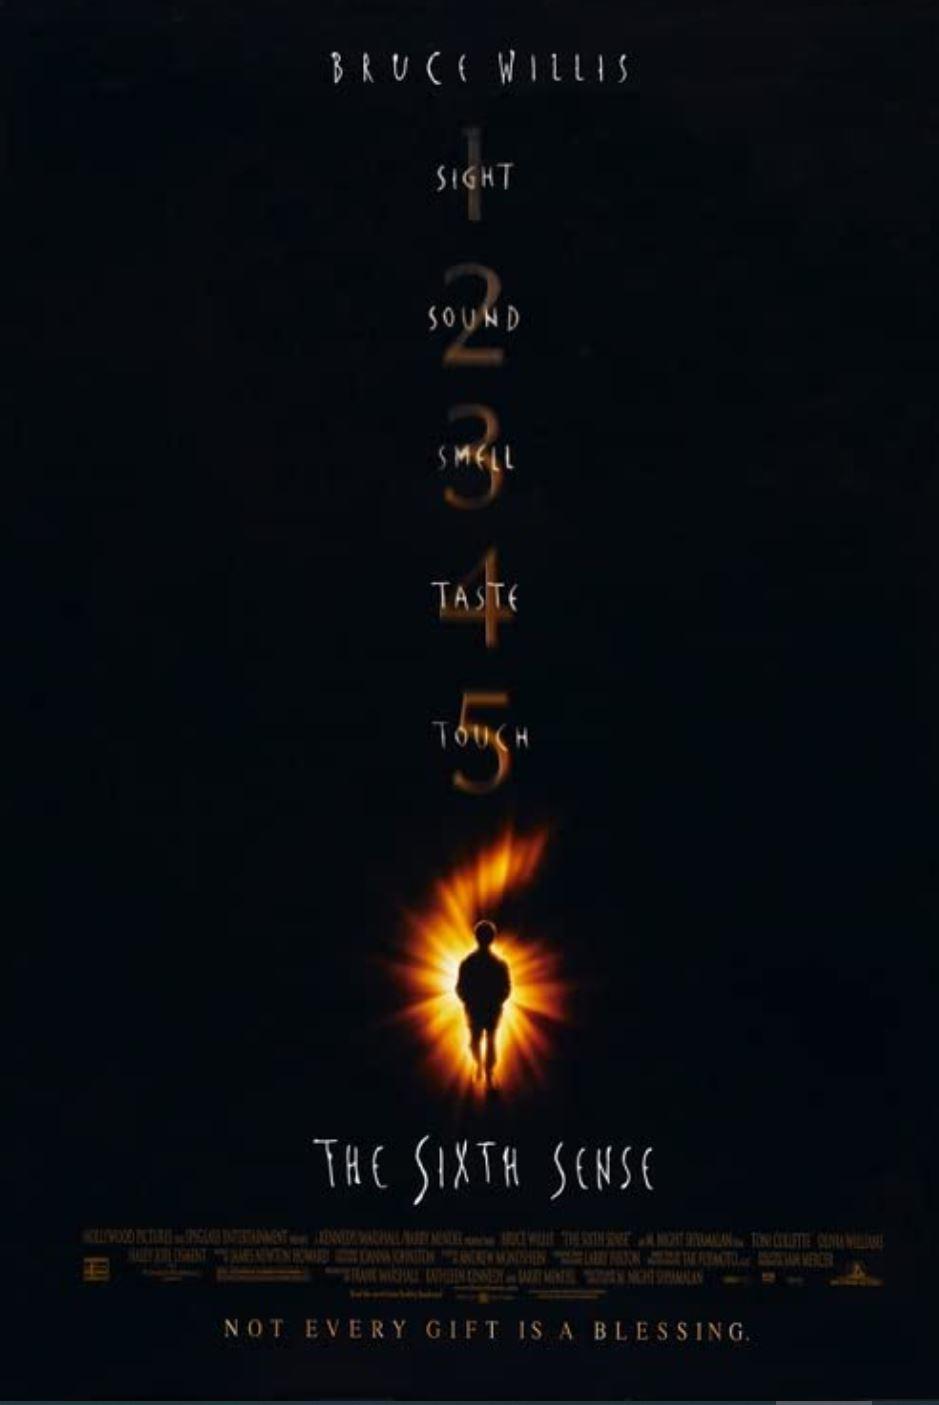 6th sense movie cover